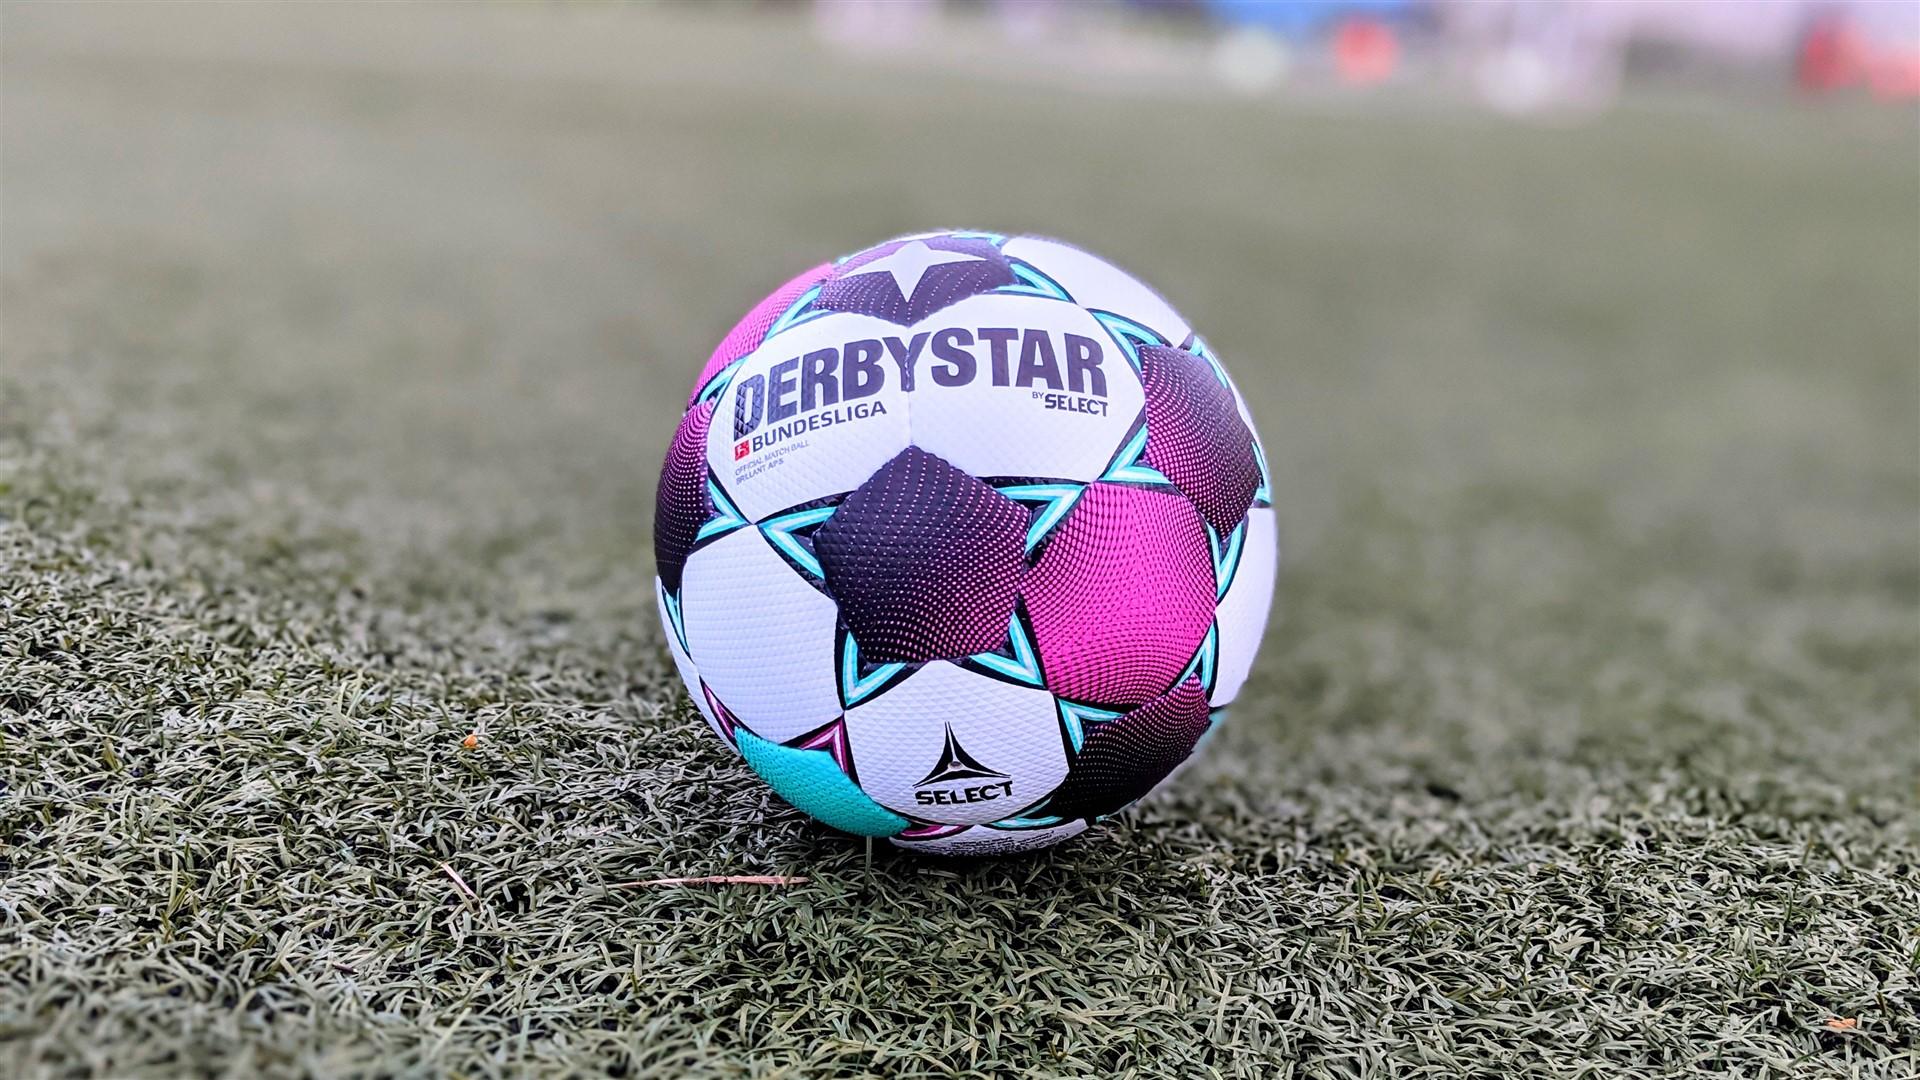 Derbystar by Select Bundesliga Official Match Ball